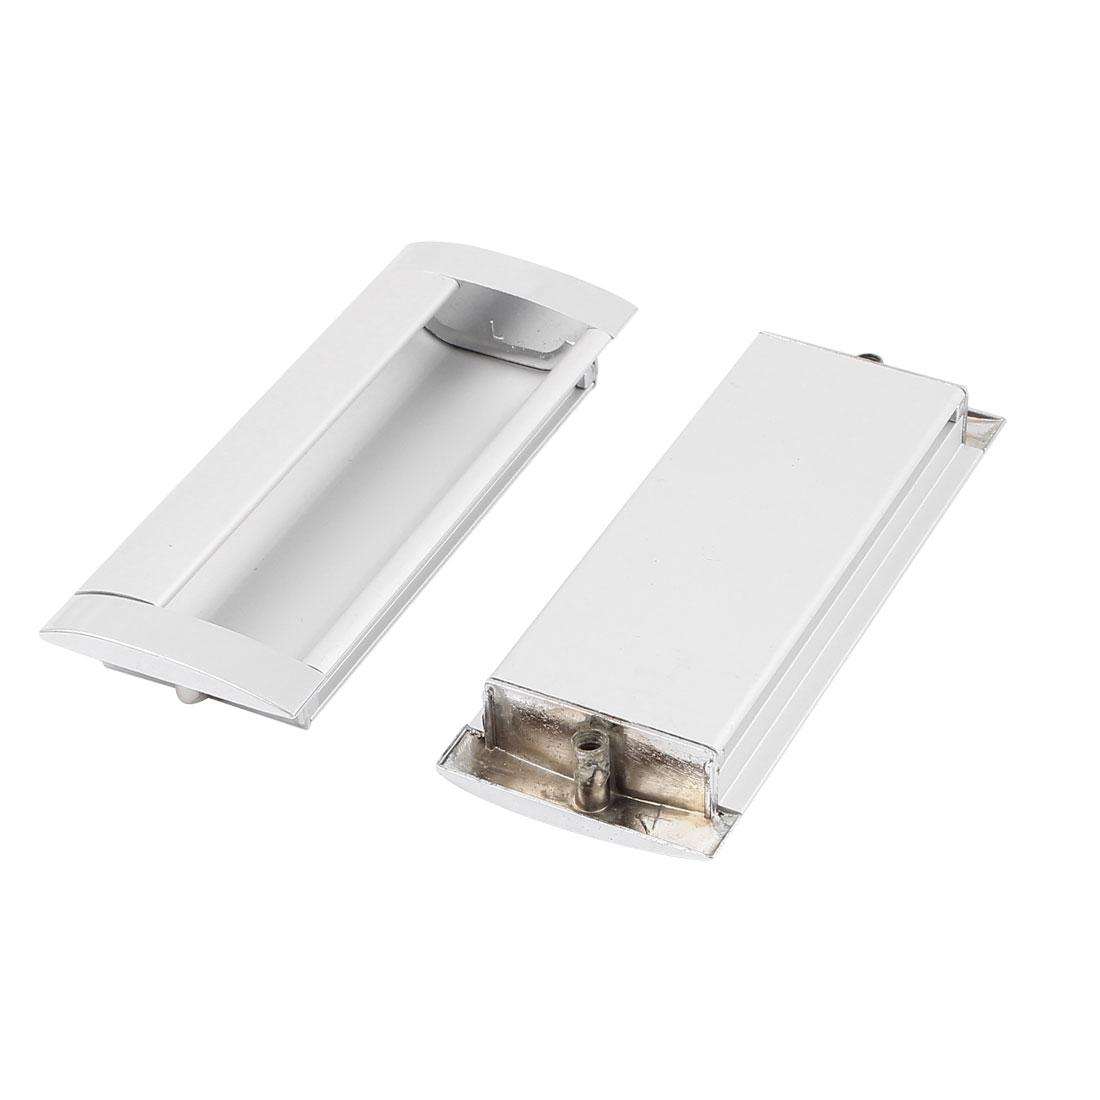 Door Windows Hardware Aluminium Pull Handle 96mm Hole Distance 2 Pcs